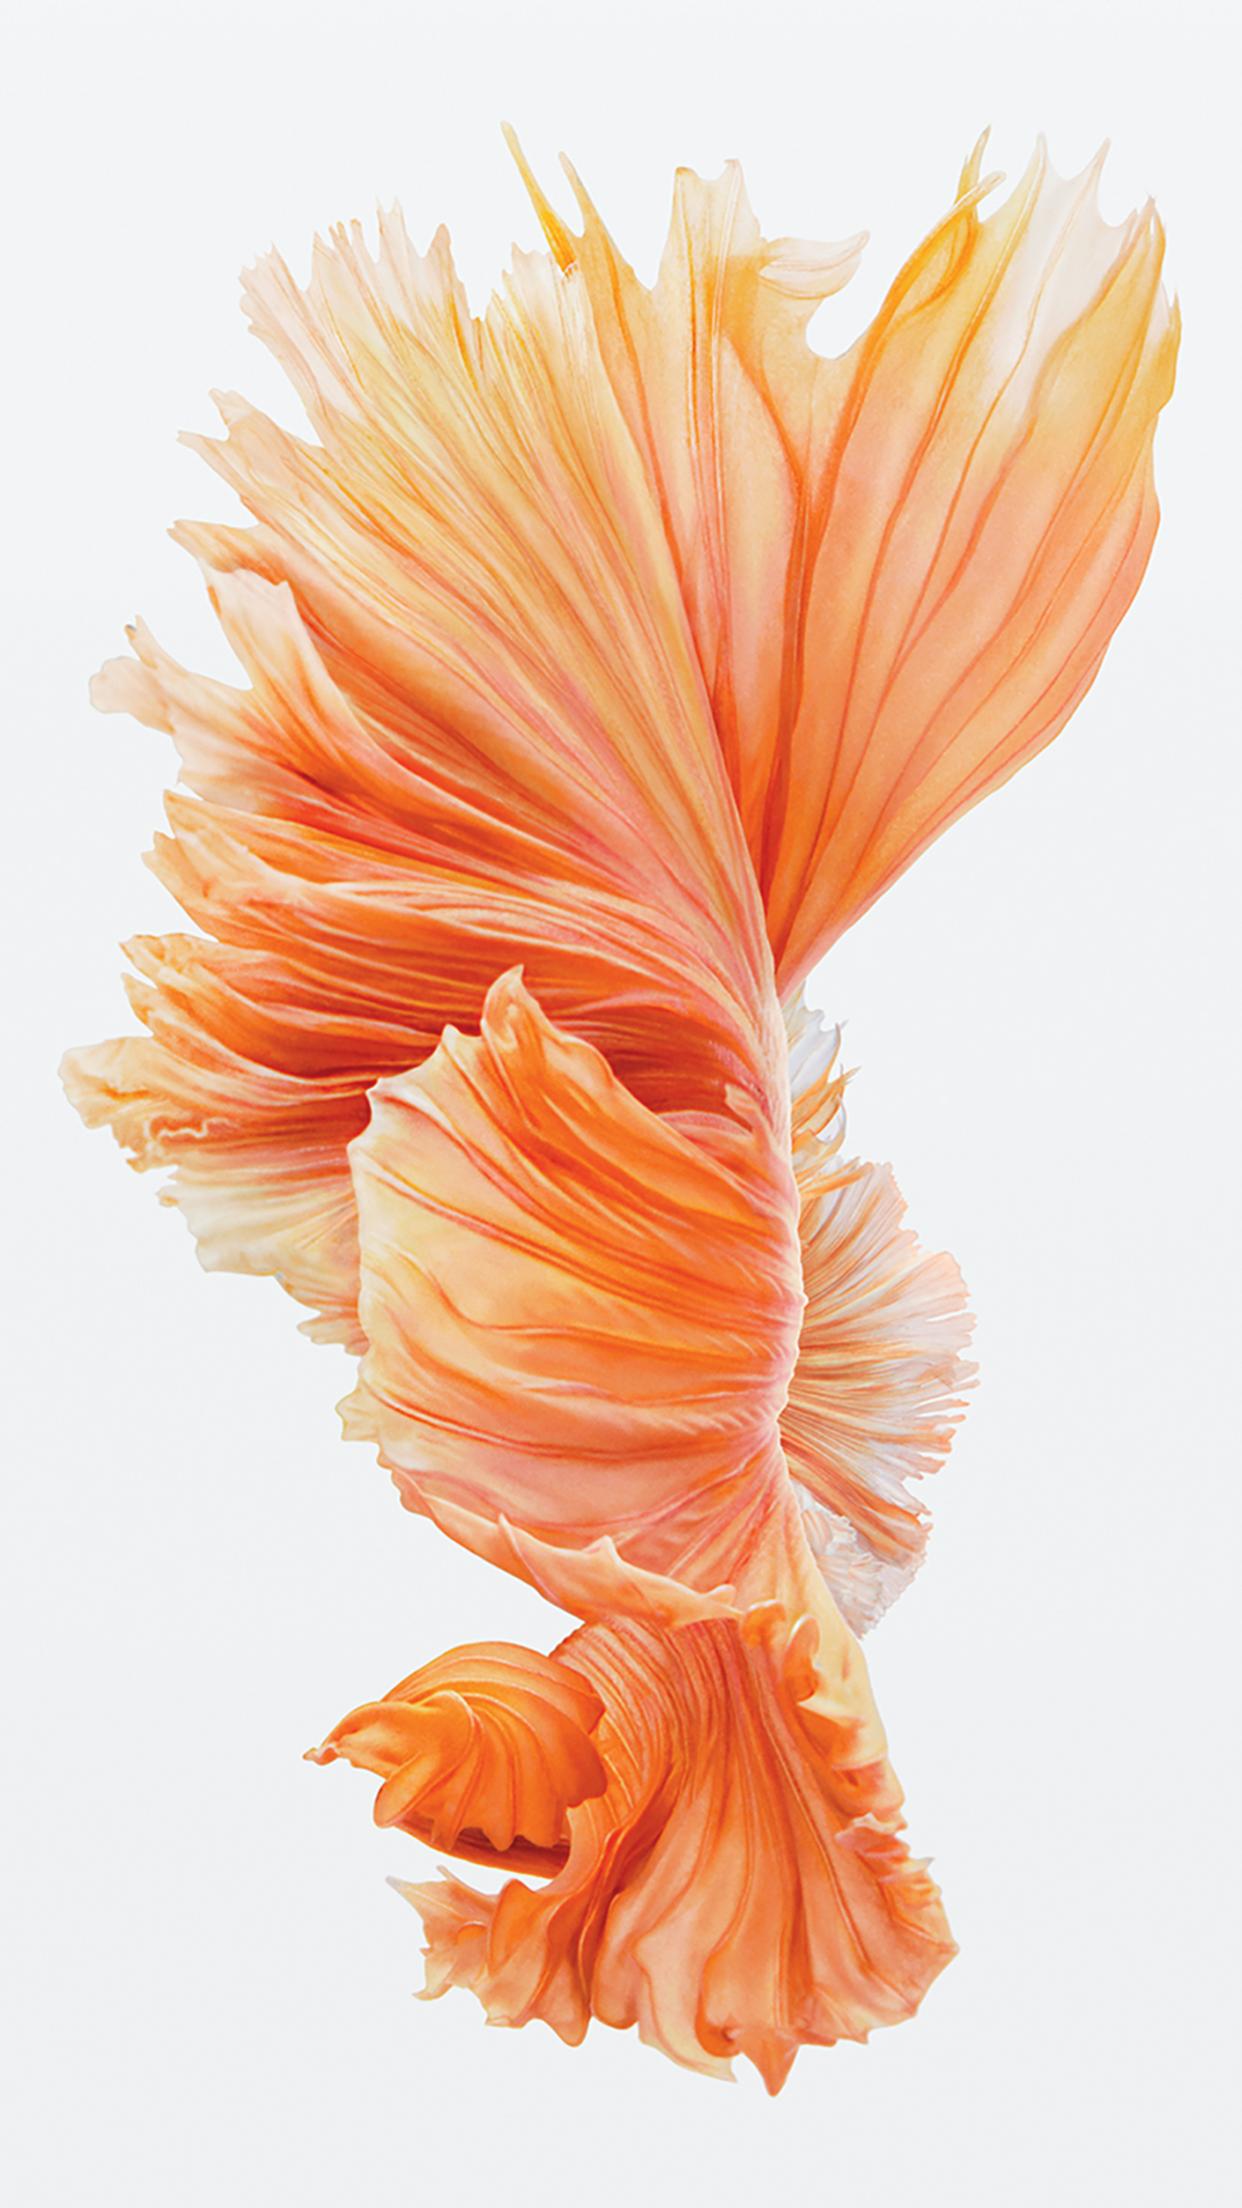 48+] Apple Live Wallpapers iPhone 6s on WallpaperSafari